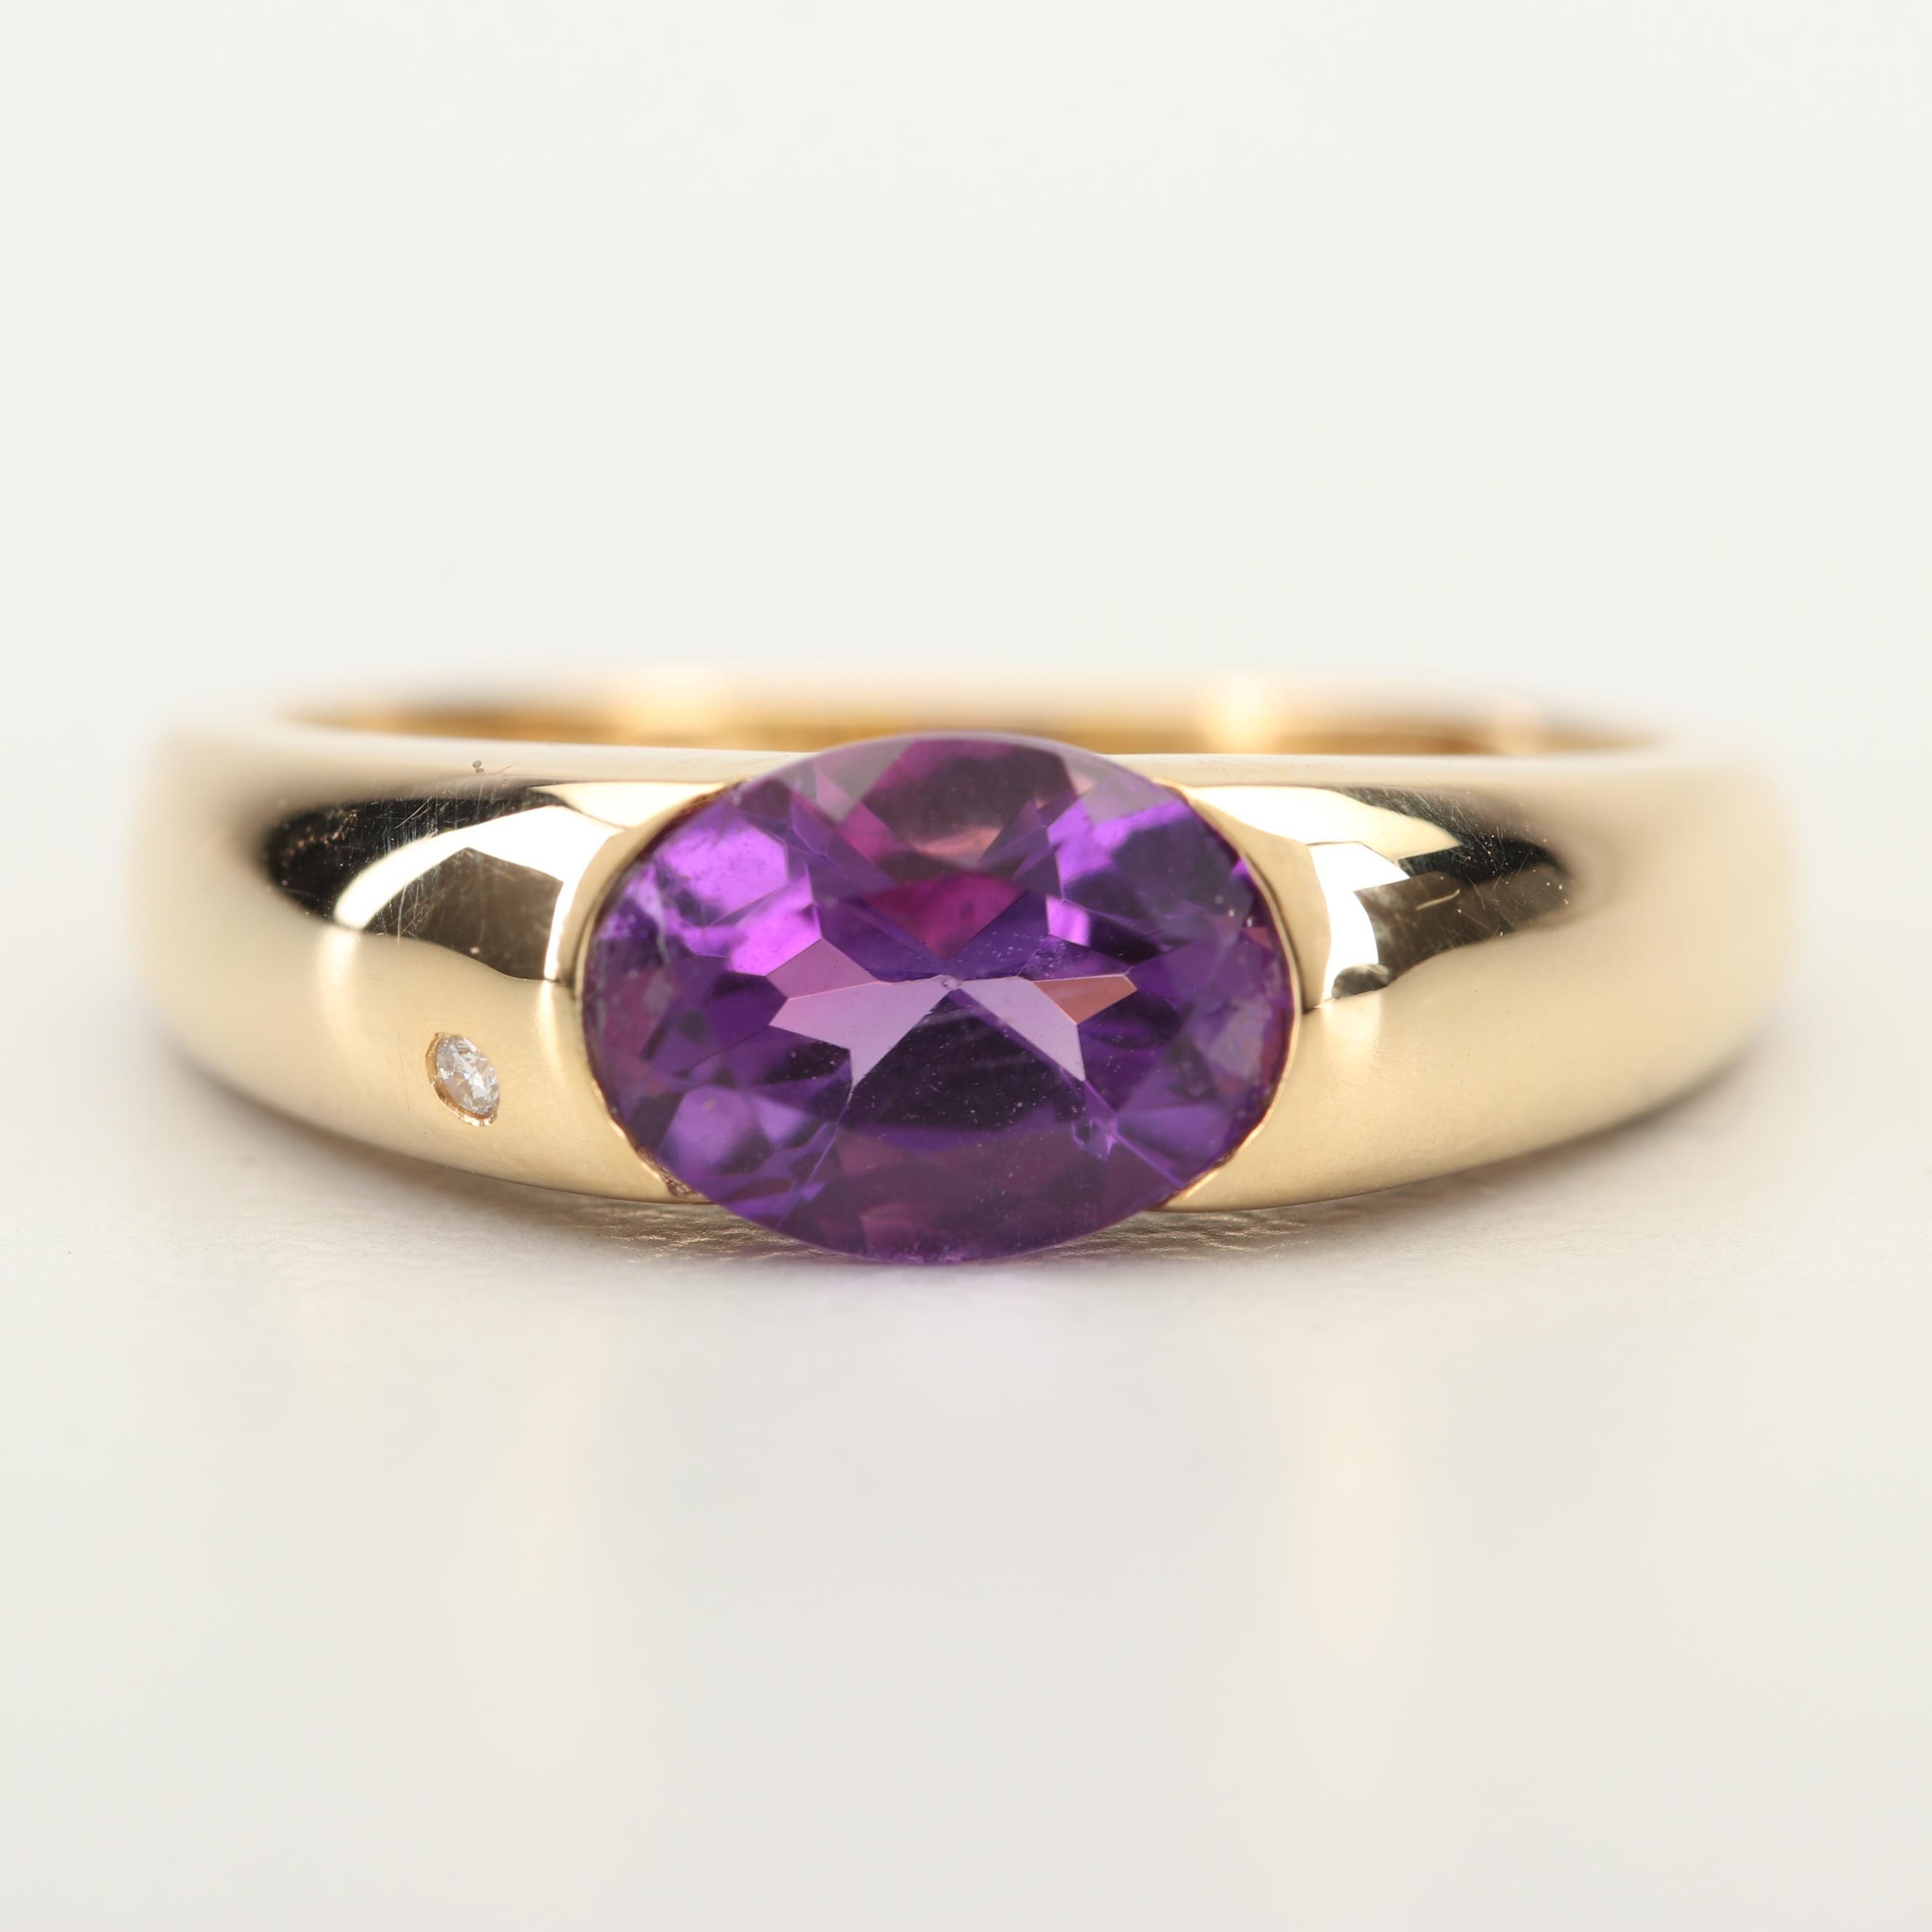 18K Yellow Gold 1.25 CT Amethyst and Diamond Ring